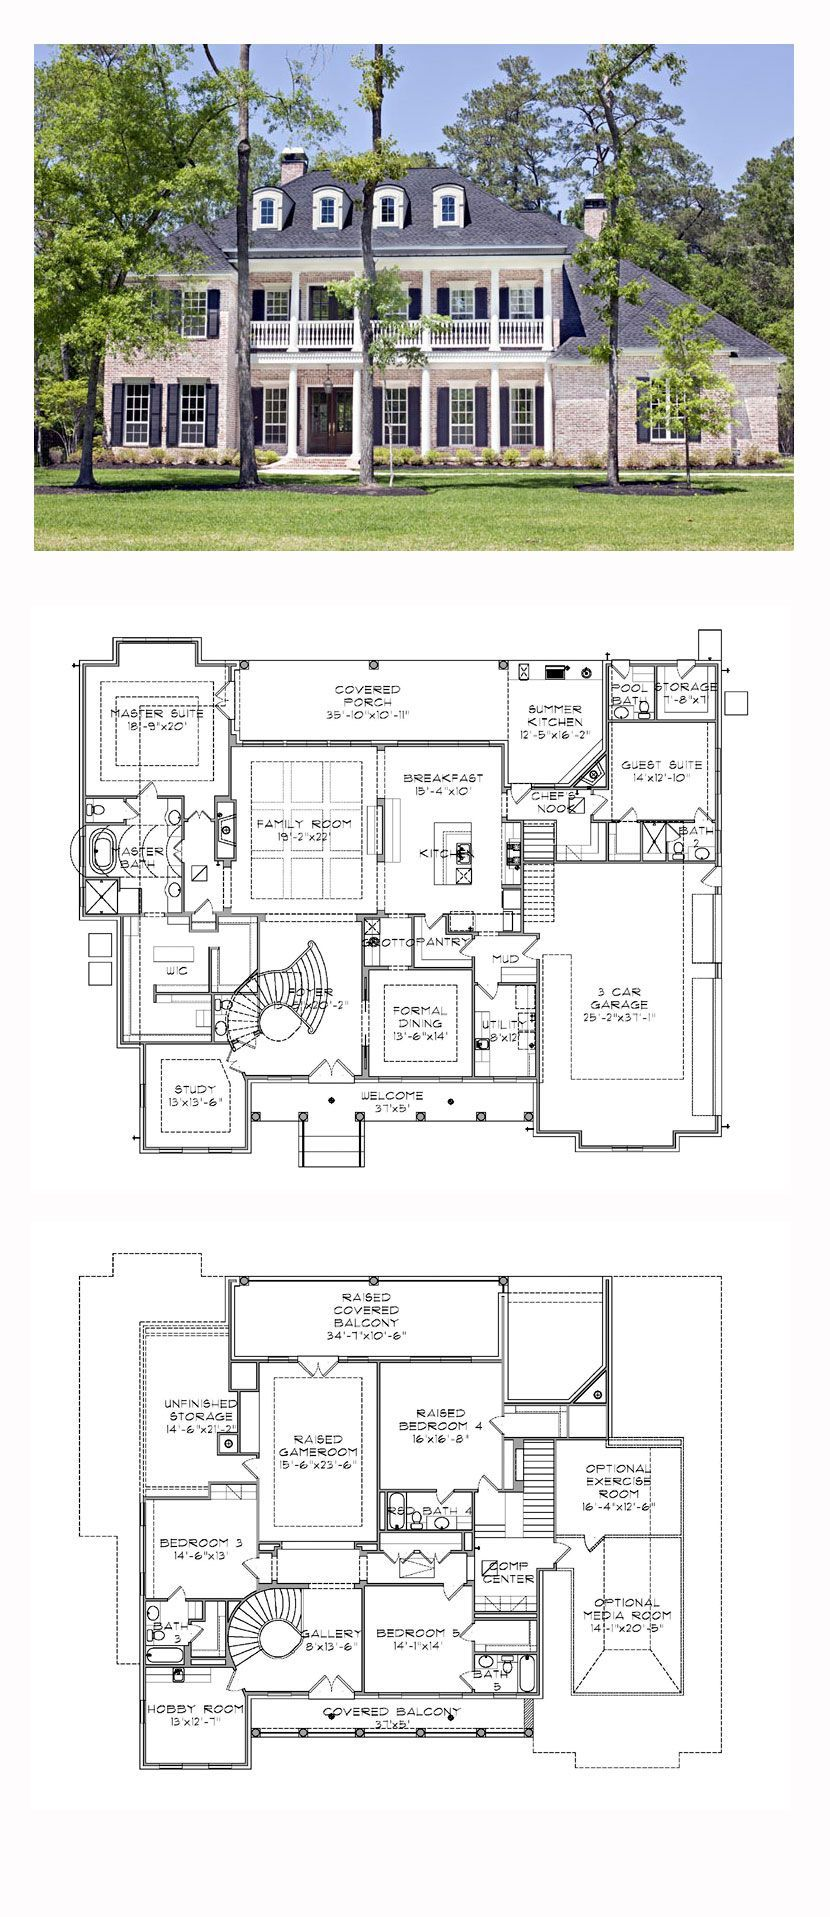 5 master bedroom house plans  Plantation House Plan   Total Living Area  sq ft